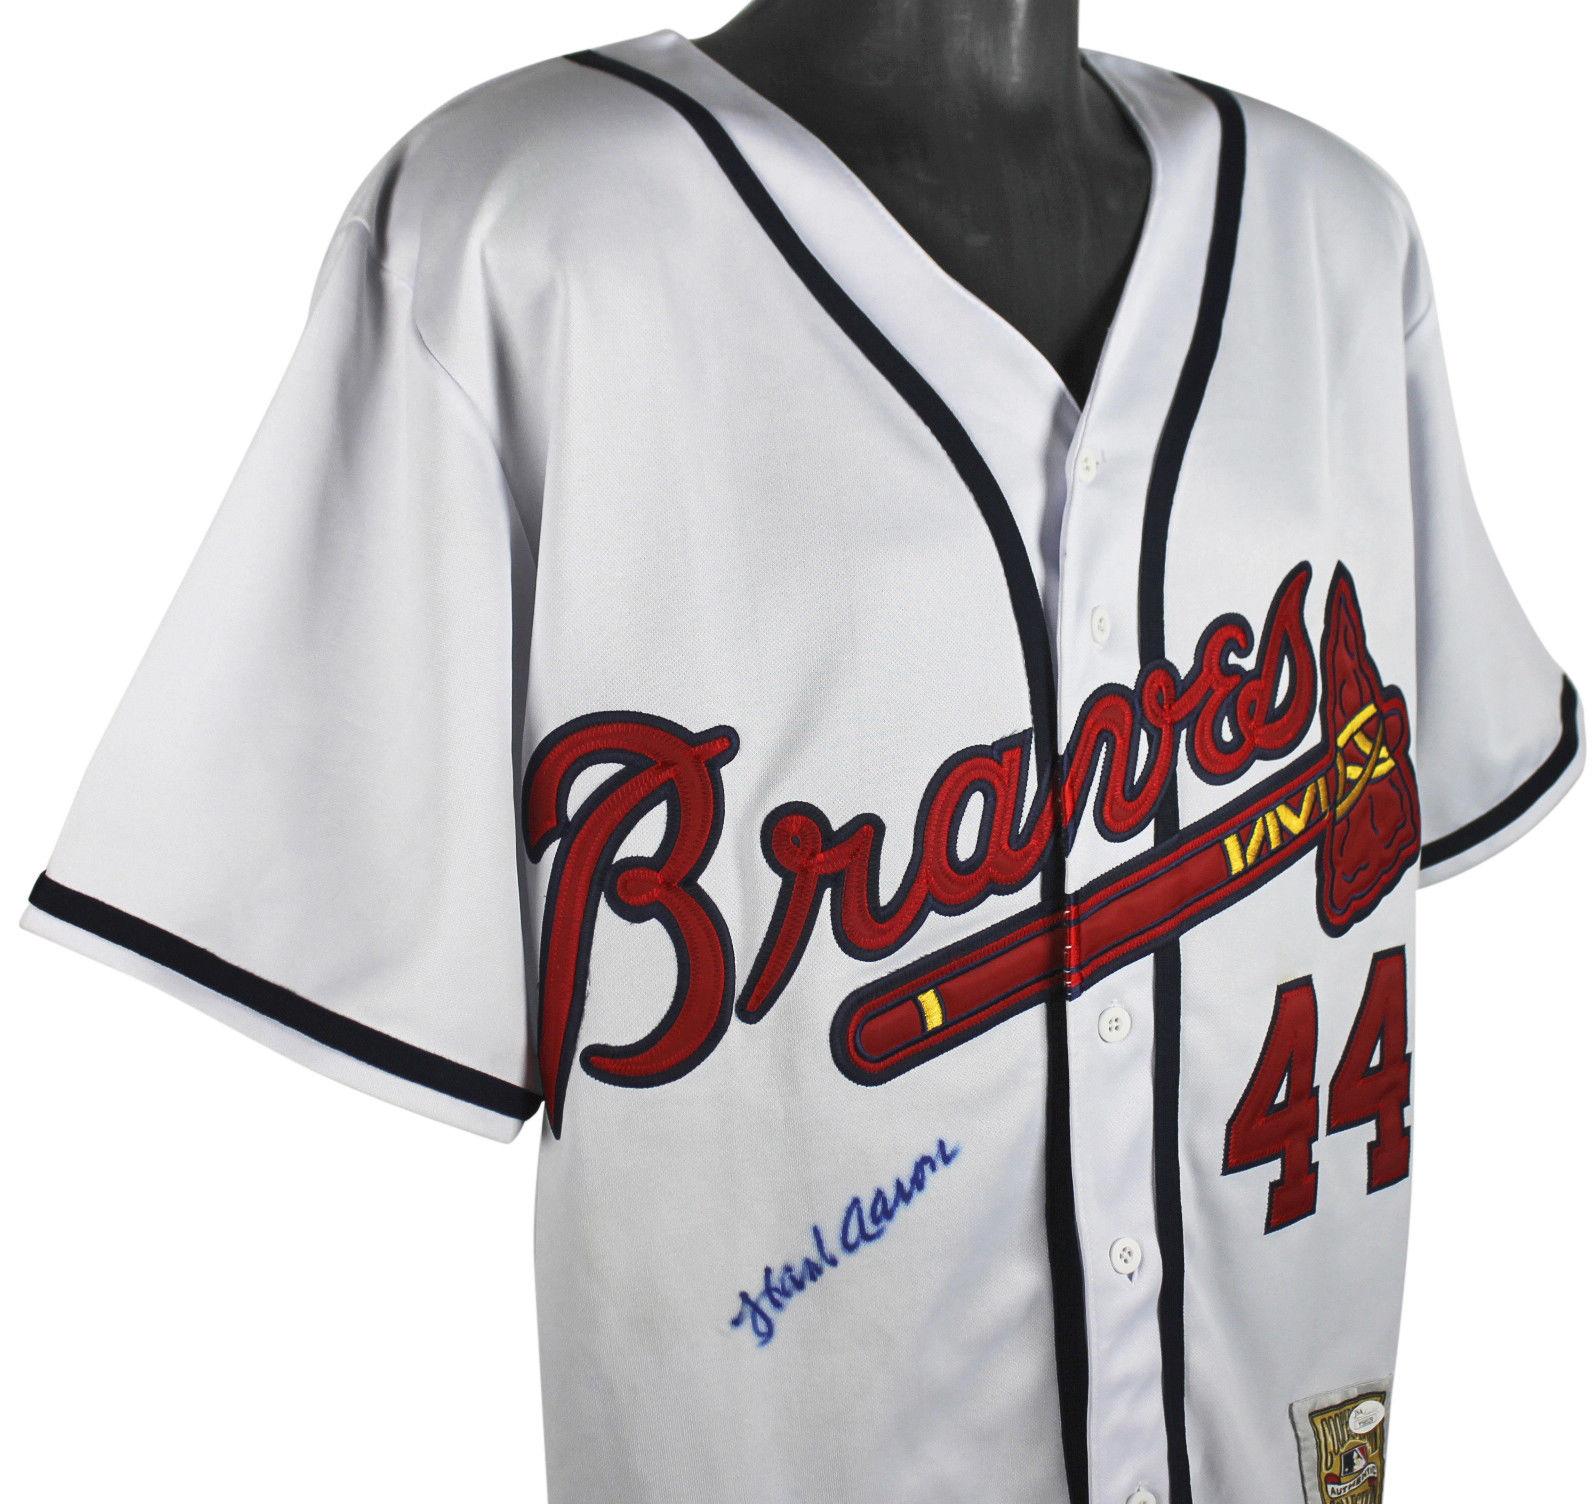 9ecb991b Lot Detail - Hank Aaron Signed Mitchell & Ness Atlanta Braves Jersey ...